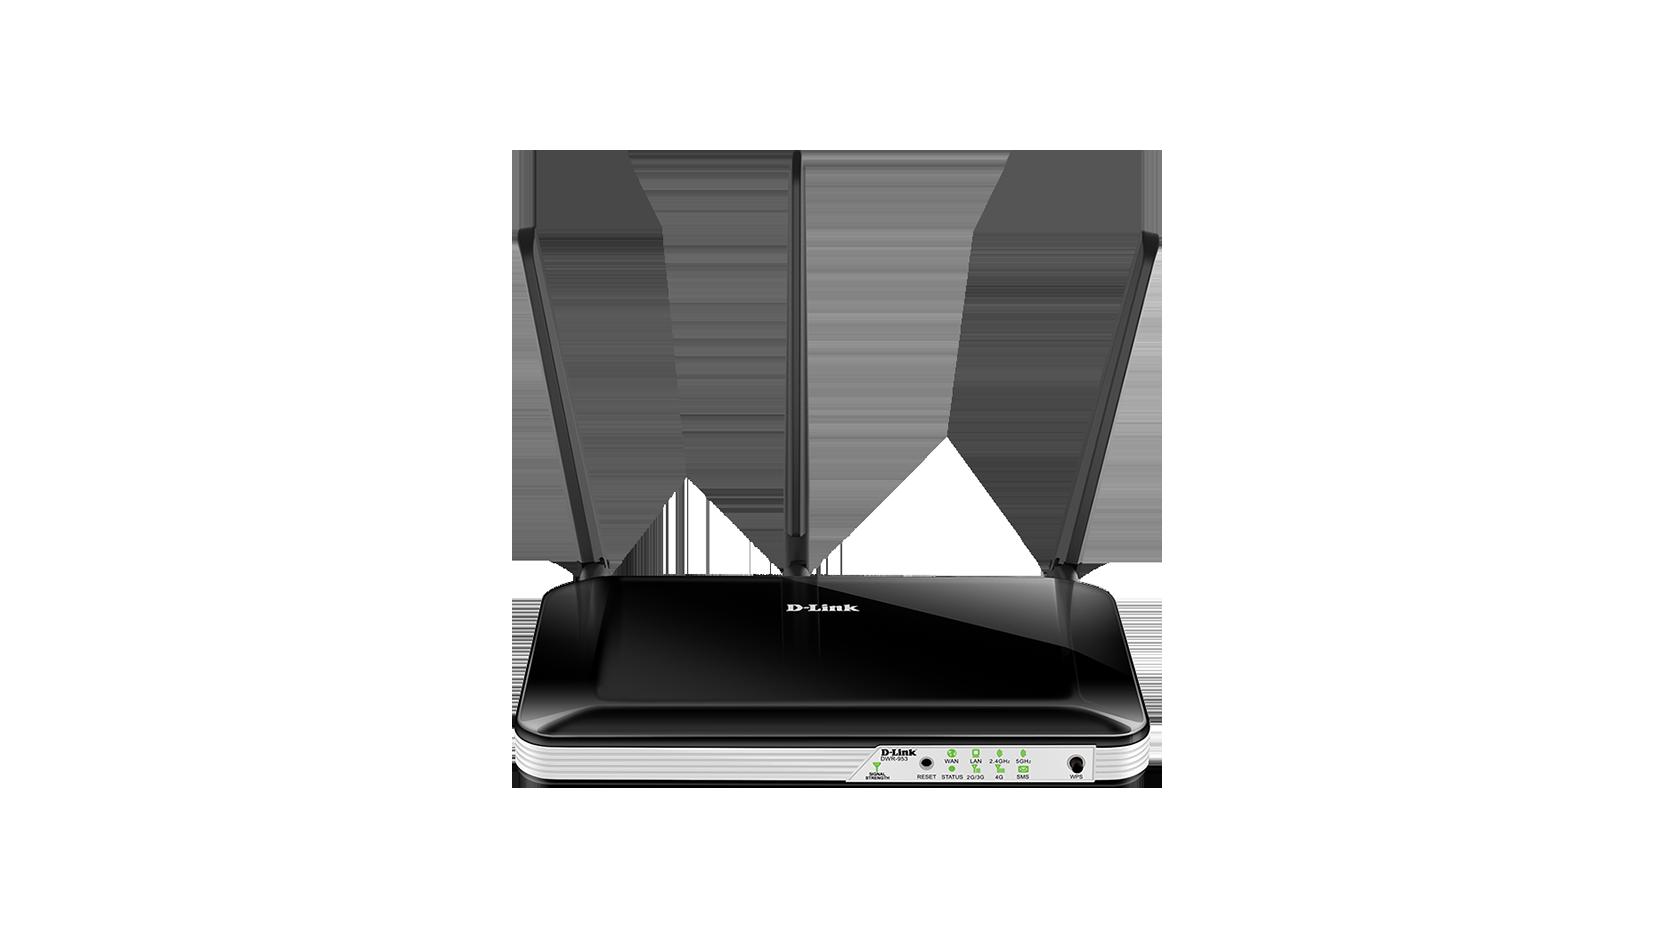 D-Link DWR-953 Wireless AC750 4G LTE Multi-WAN Router